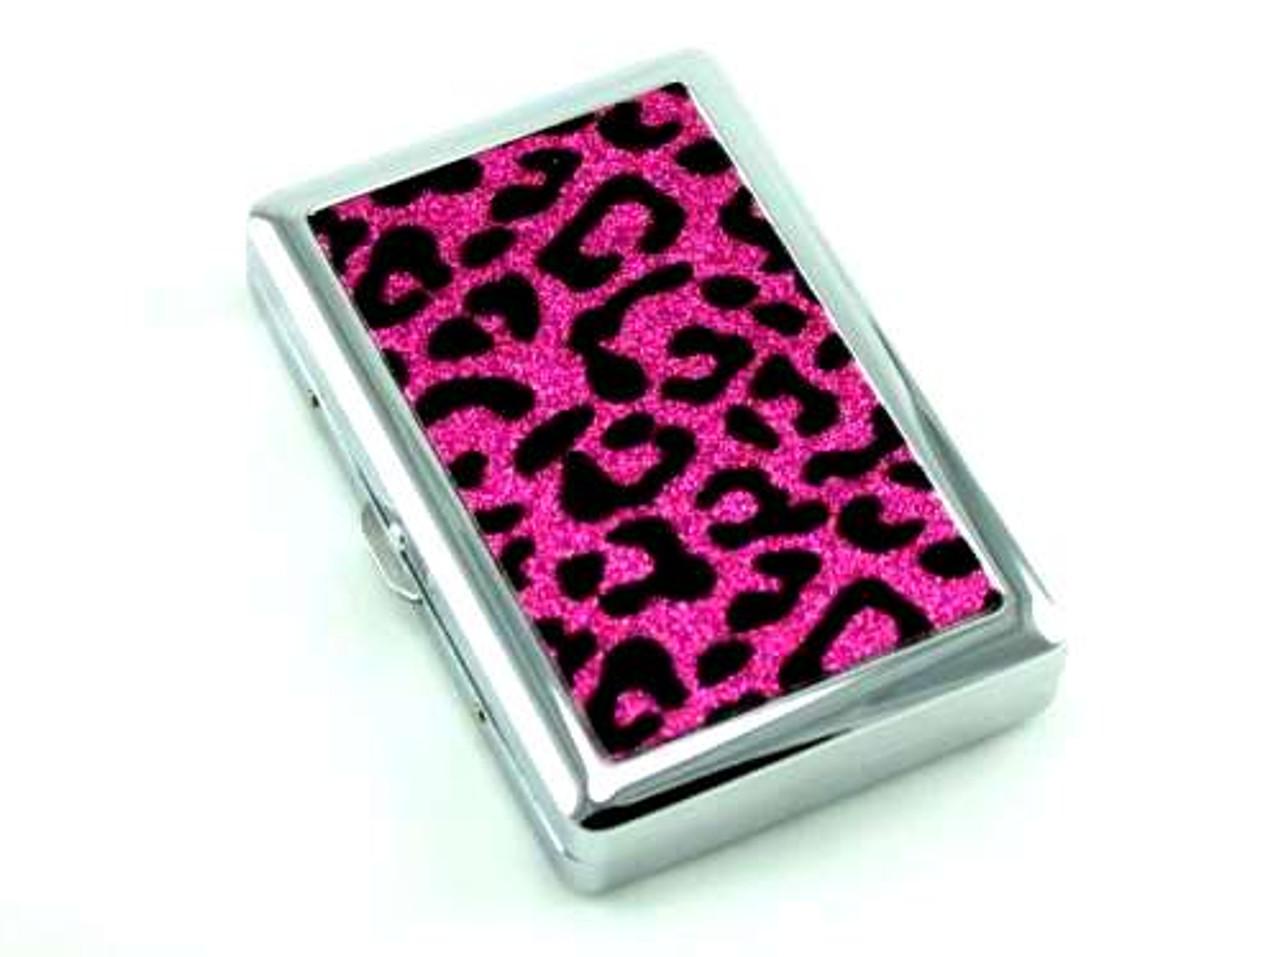 Pink Sparkling Cheetah Cigarette Case